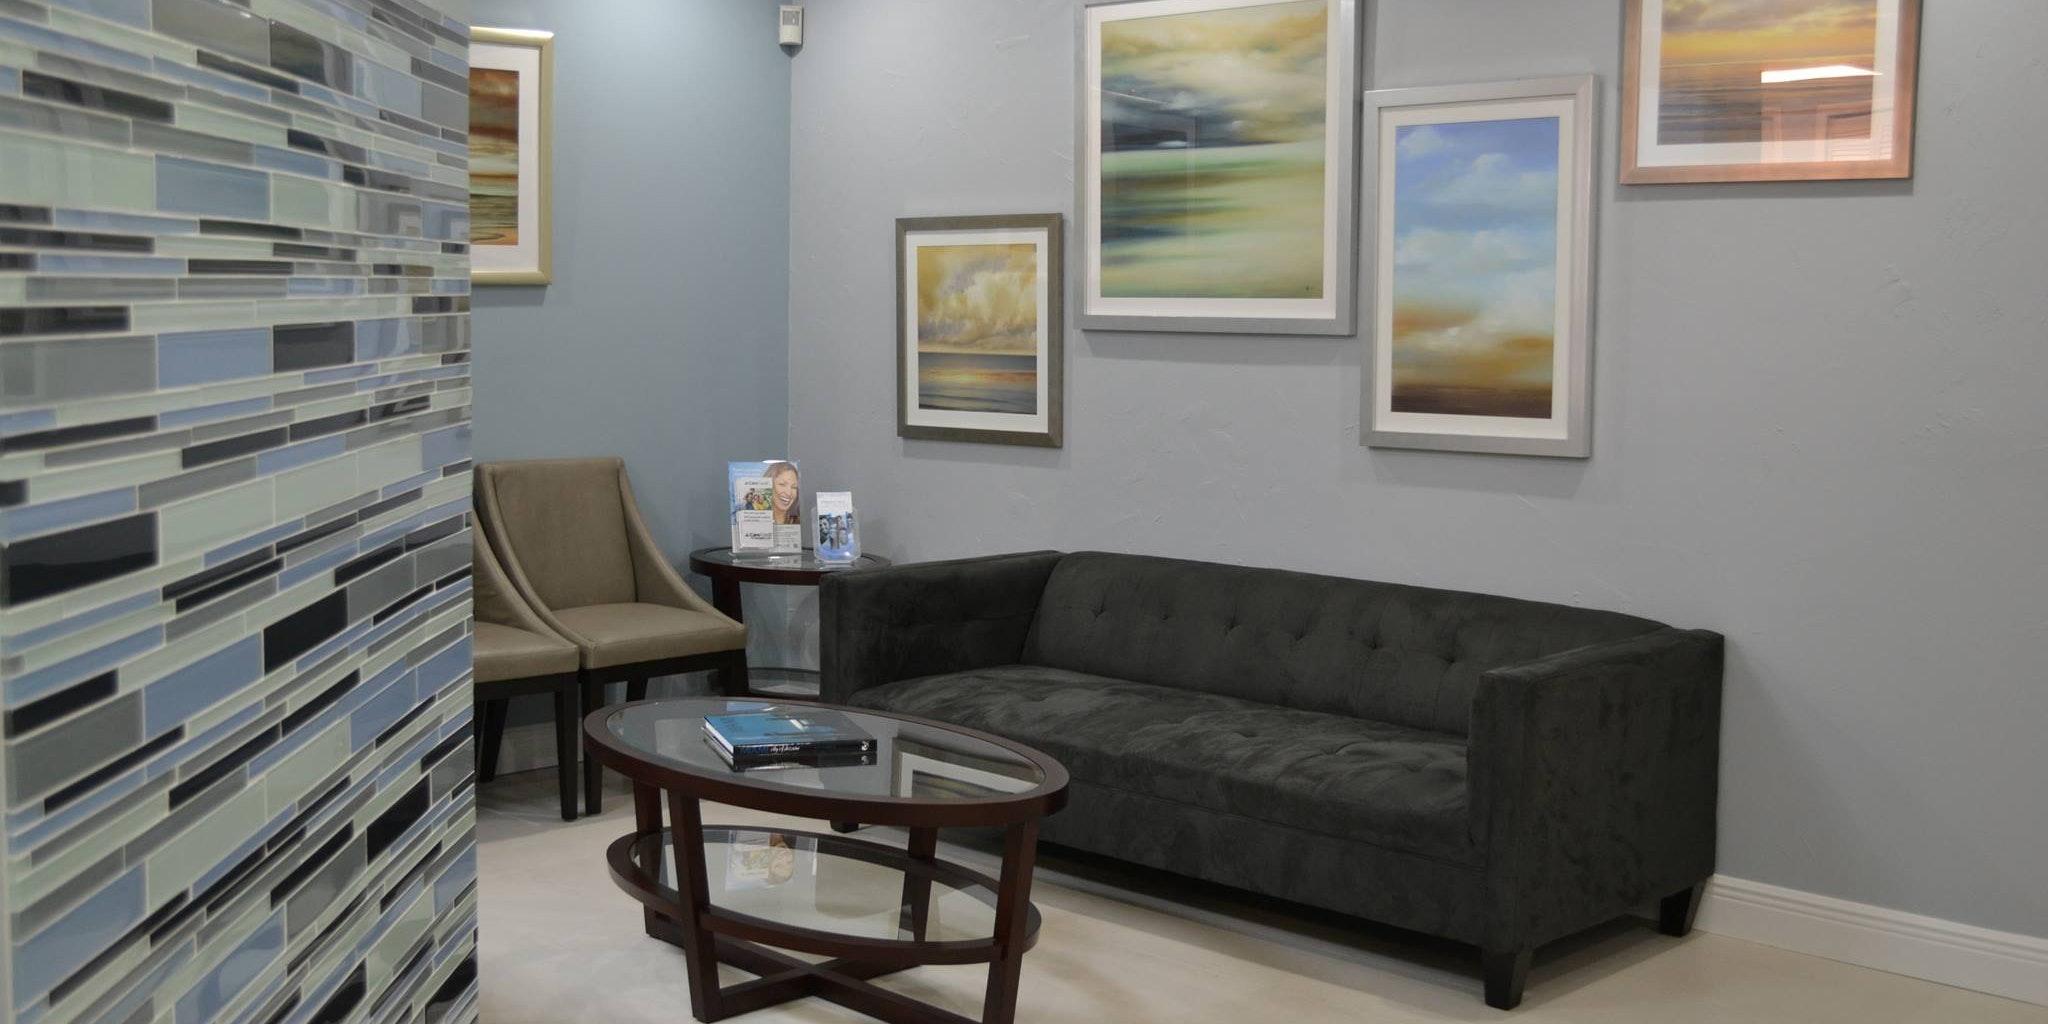 Miami Dentistry Center